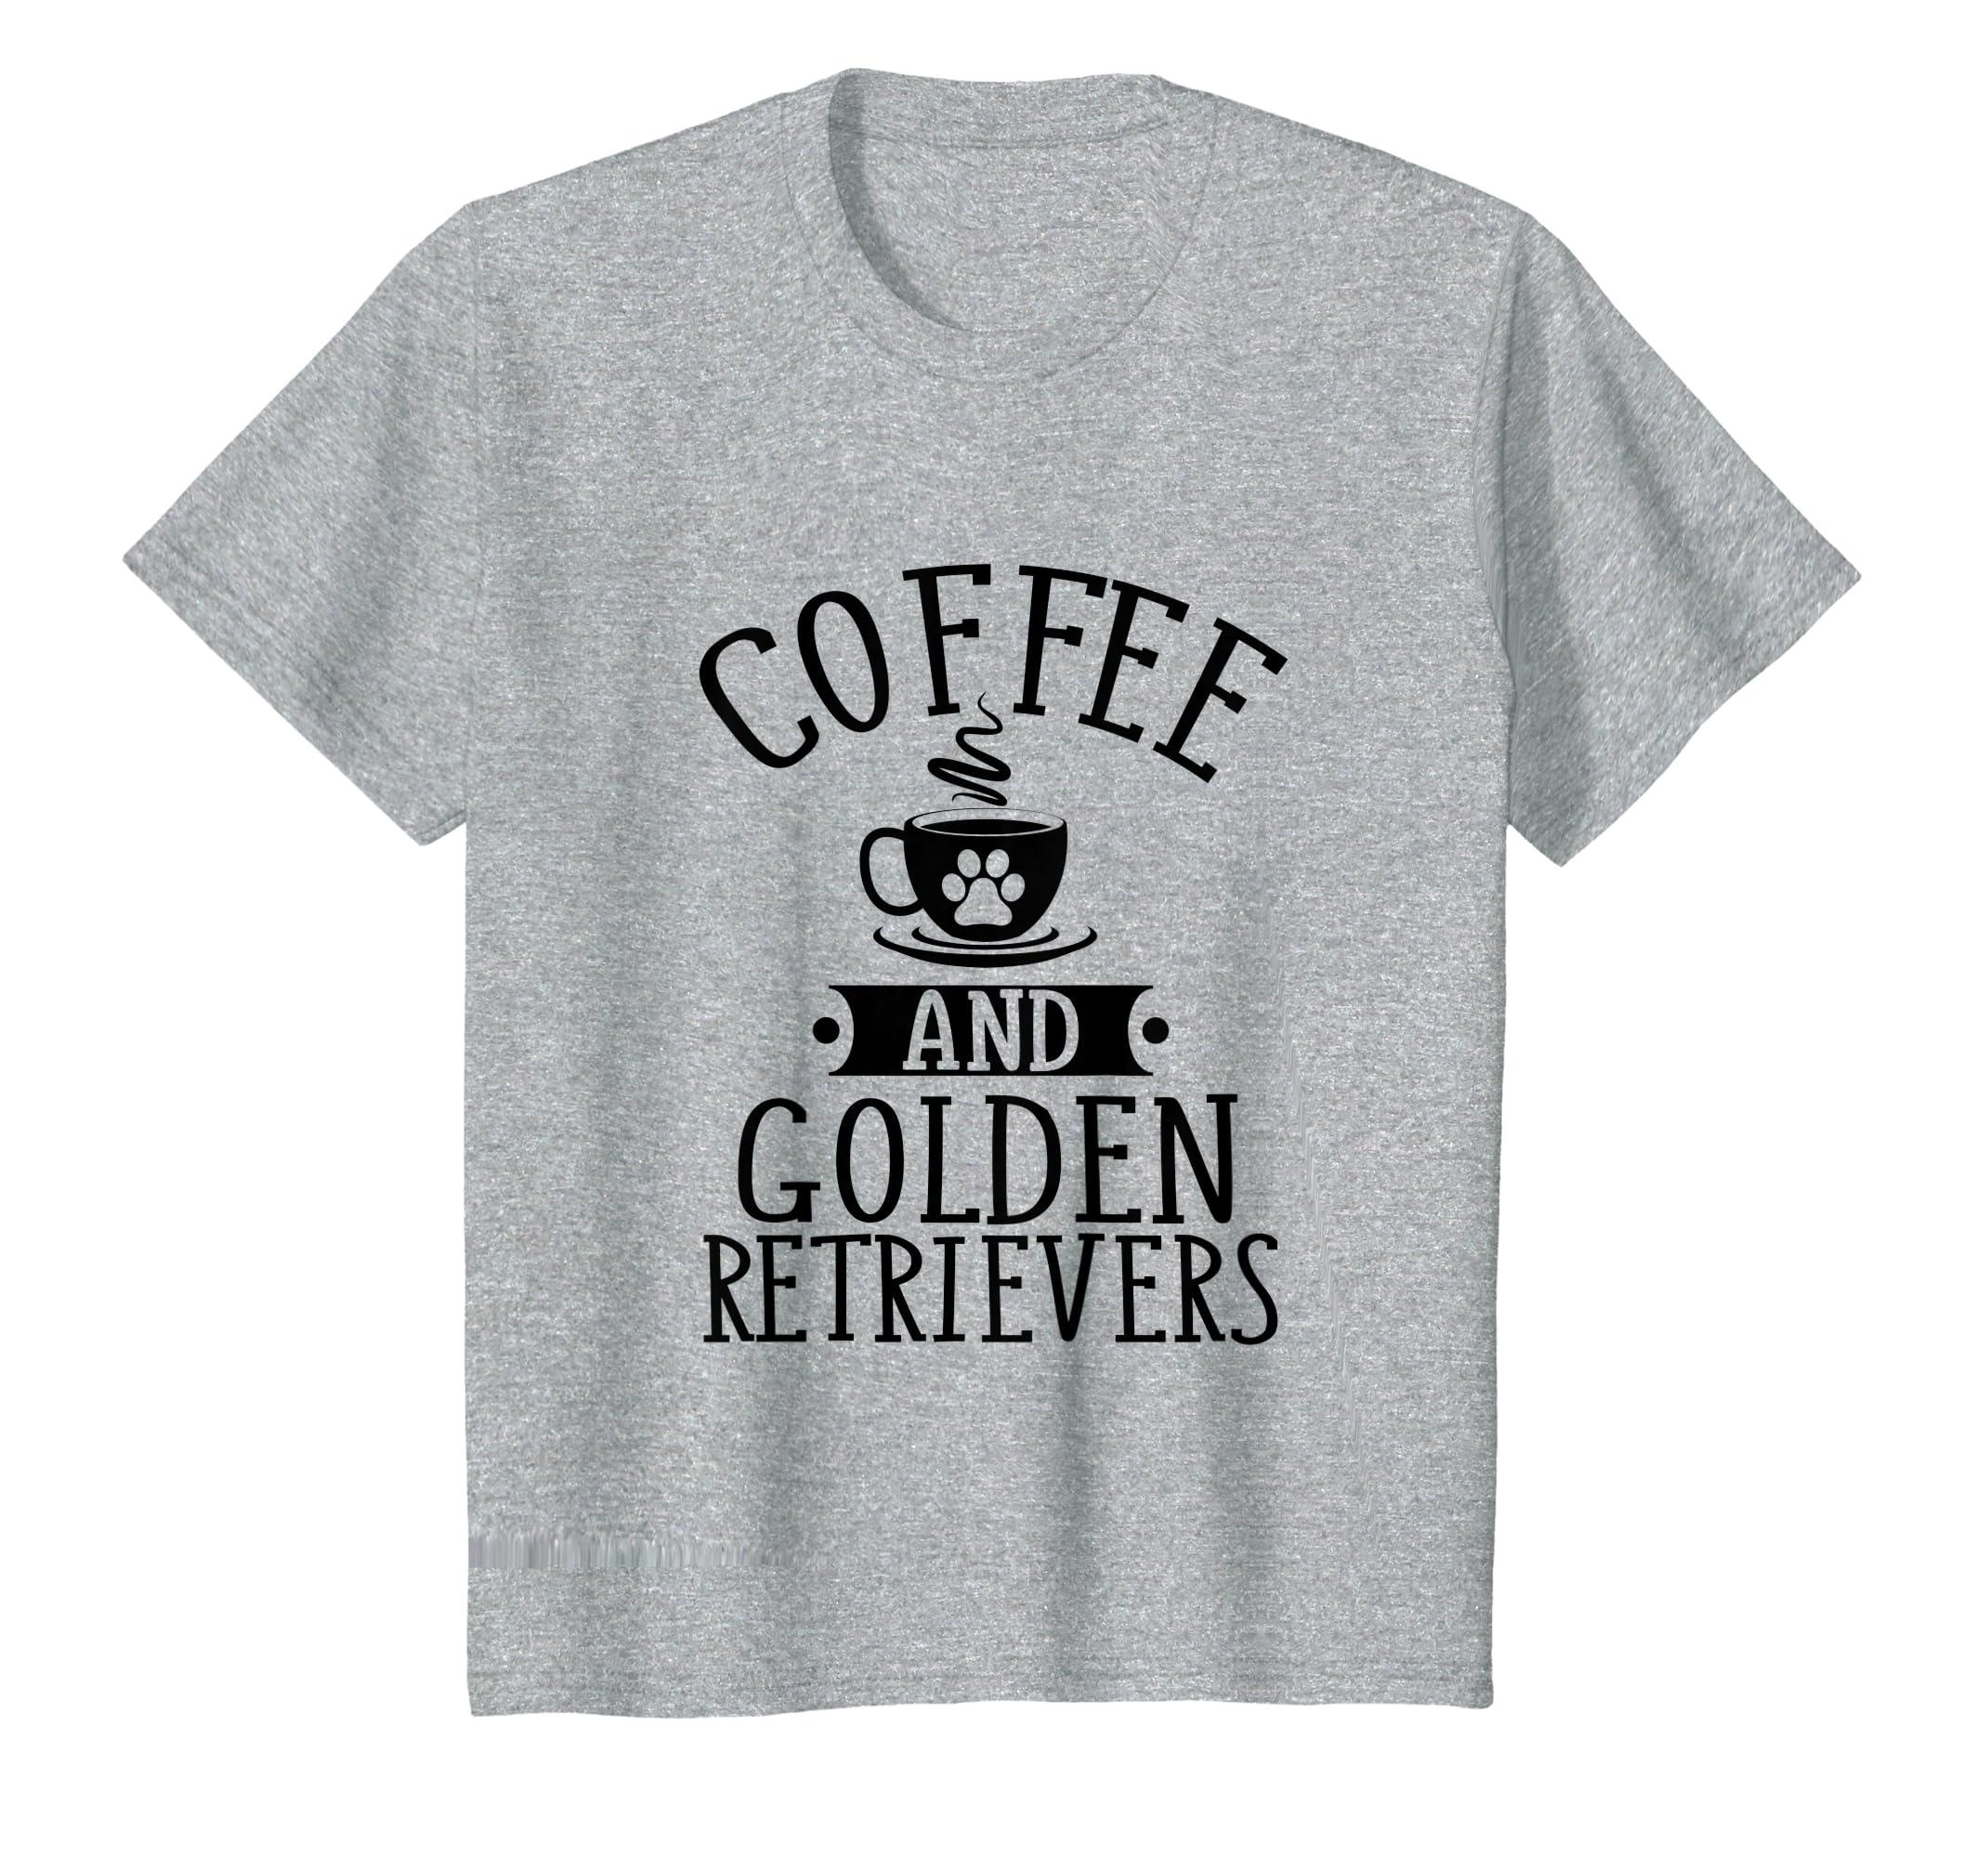 1cad284e0039a4 Amazon.com: Coffee and Golden Retrievers - Golden Lover Shirt Gift: Clothing